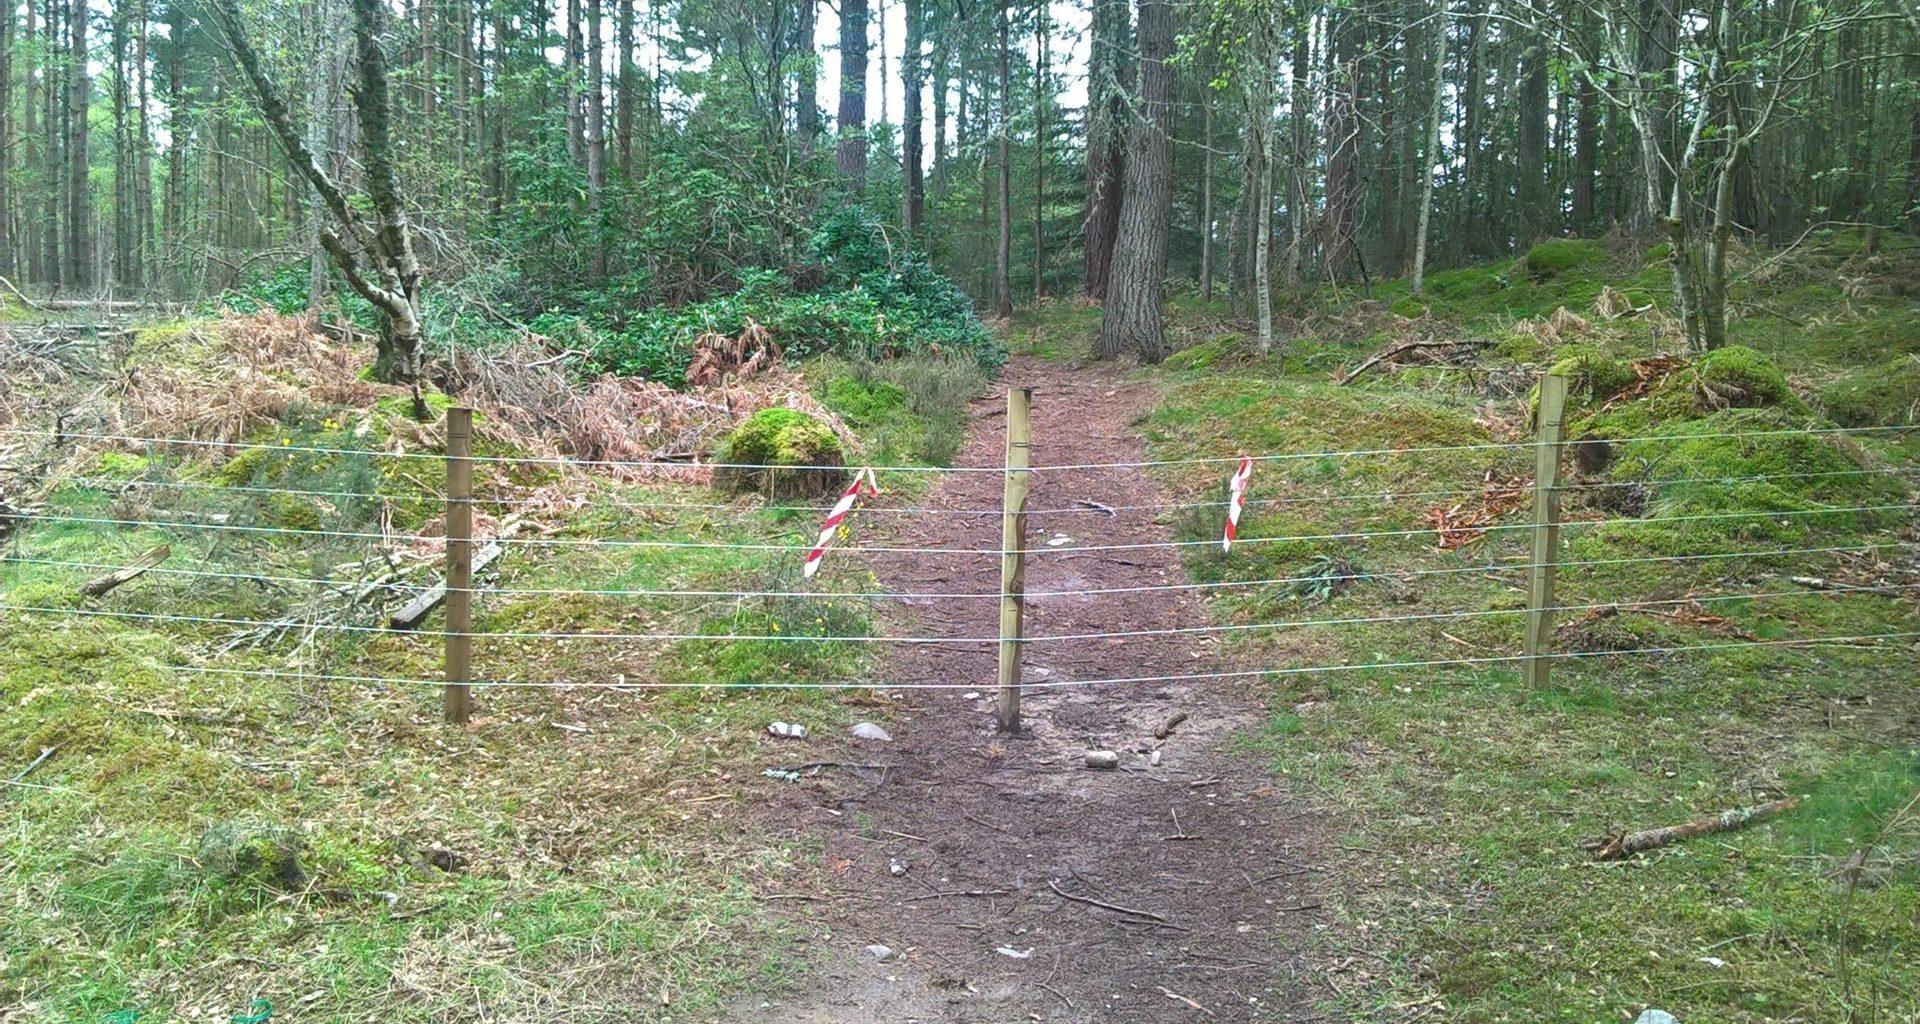 Moray estate 'illegally' blocking land access, says MSP 8